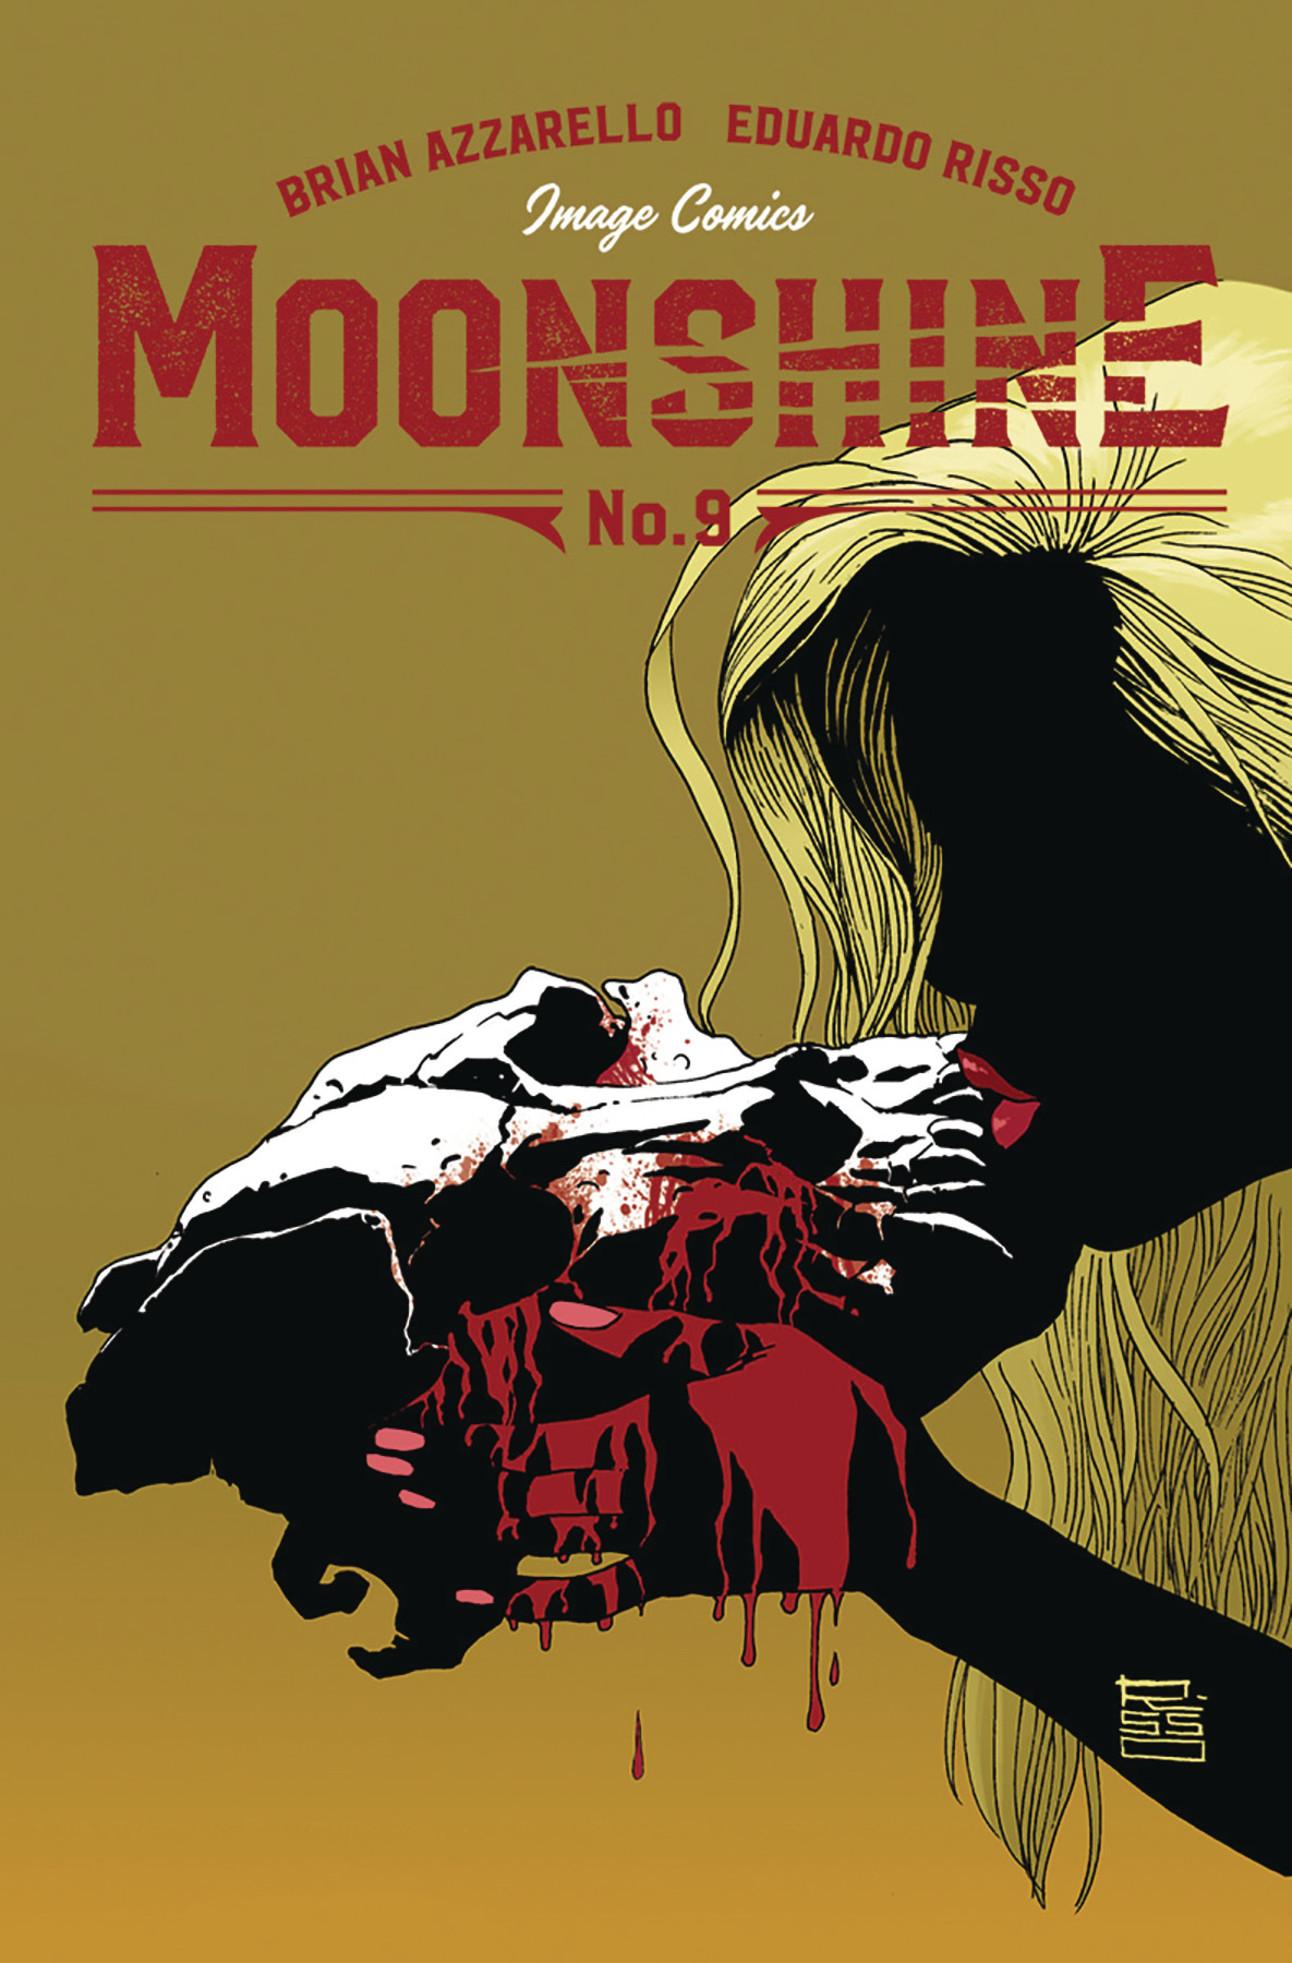 Moonshine #9 Cover by Eduardo Risso